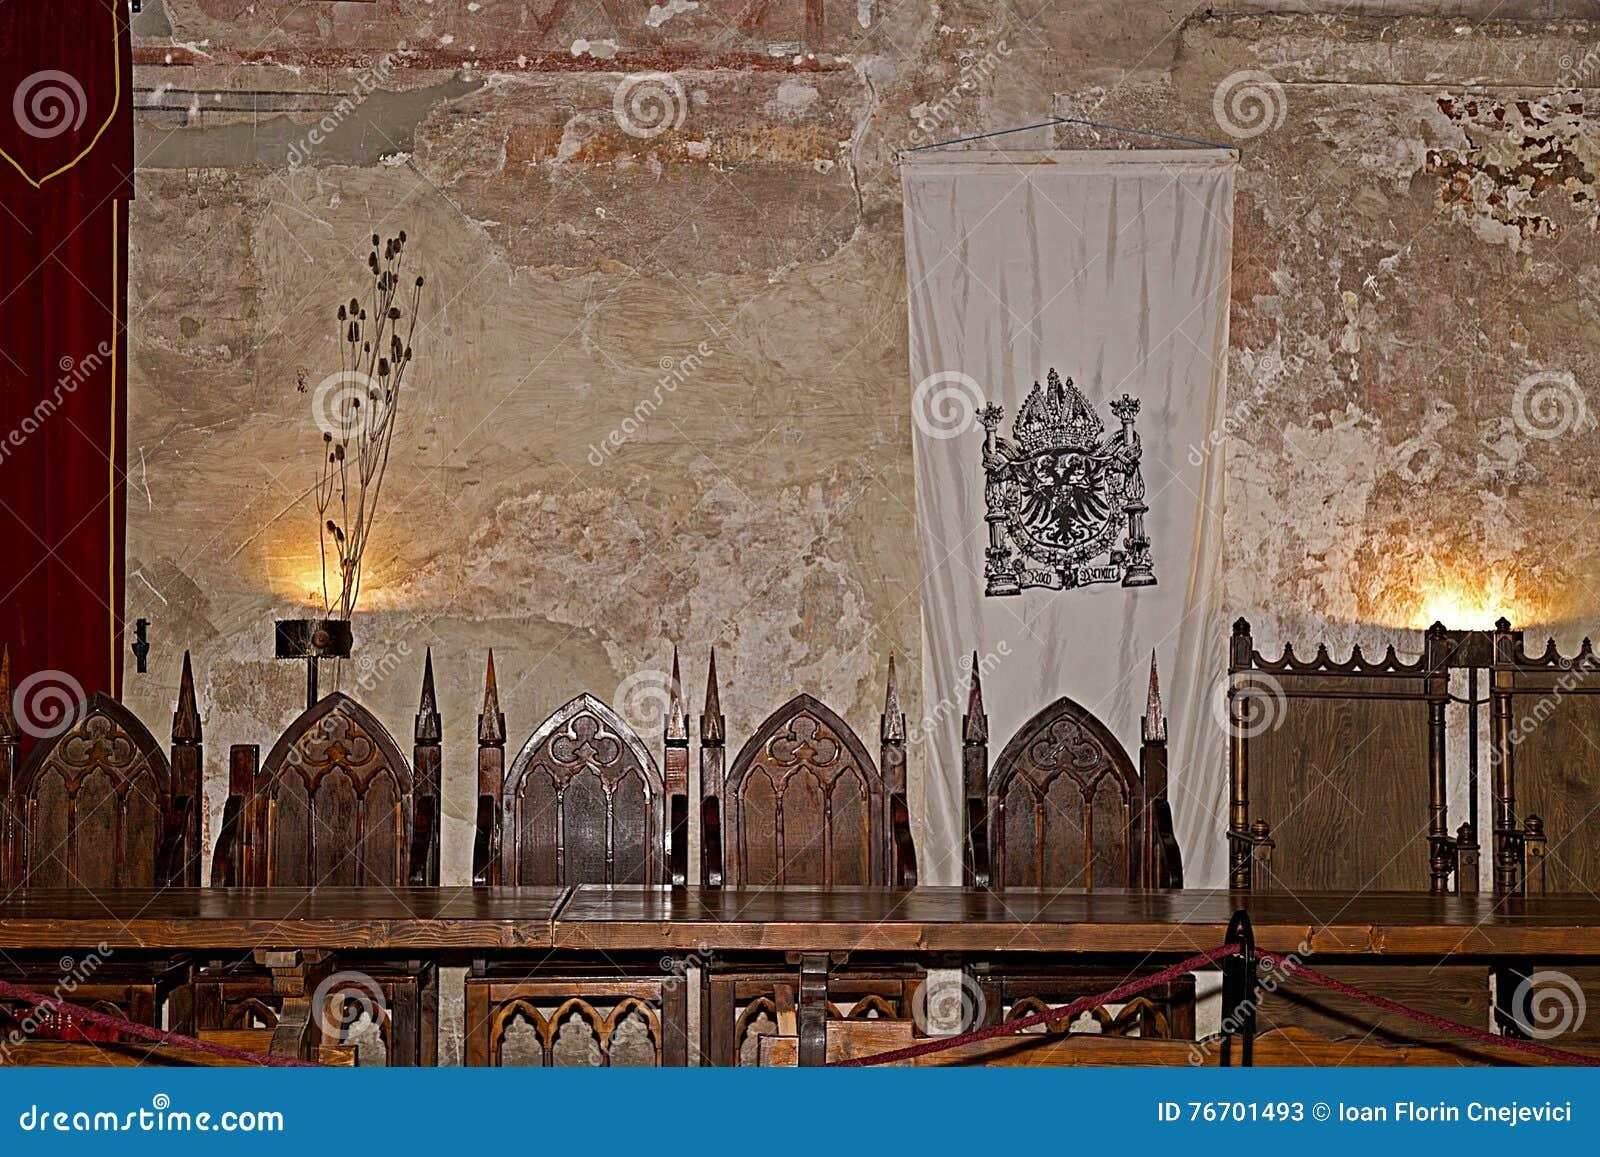 Tabla de caballeros Castillo de Corvins, Transilvania, Rumania